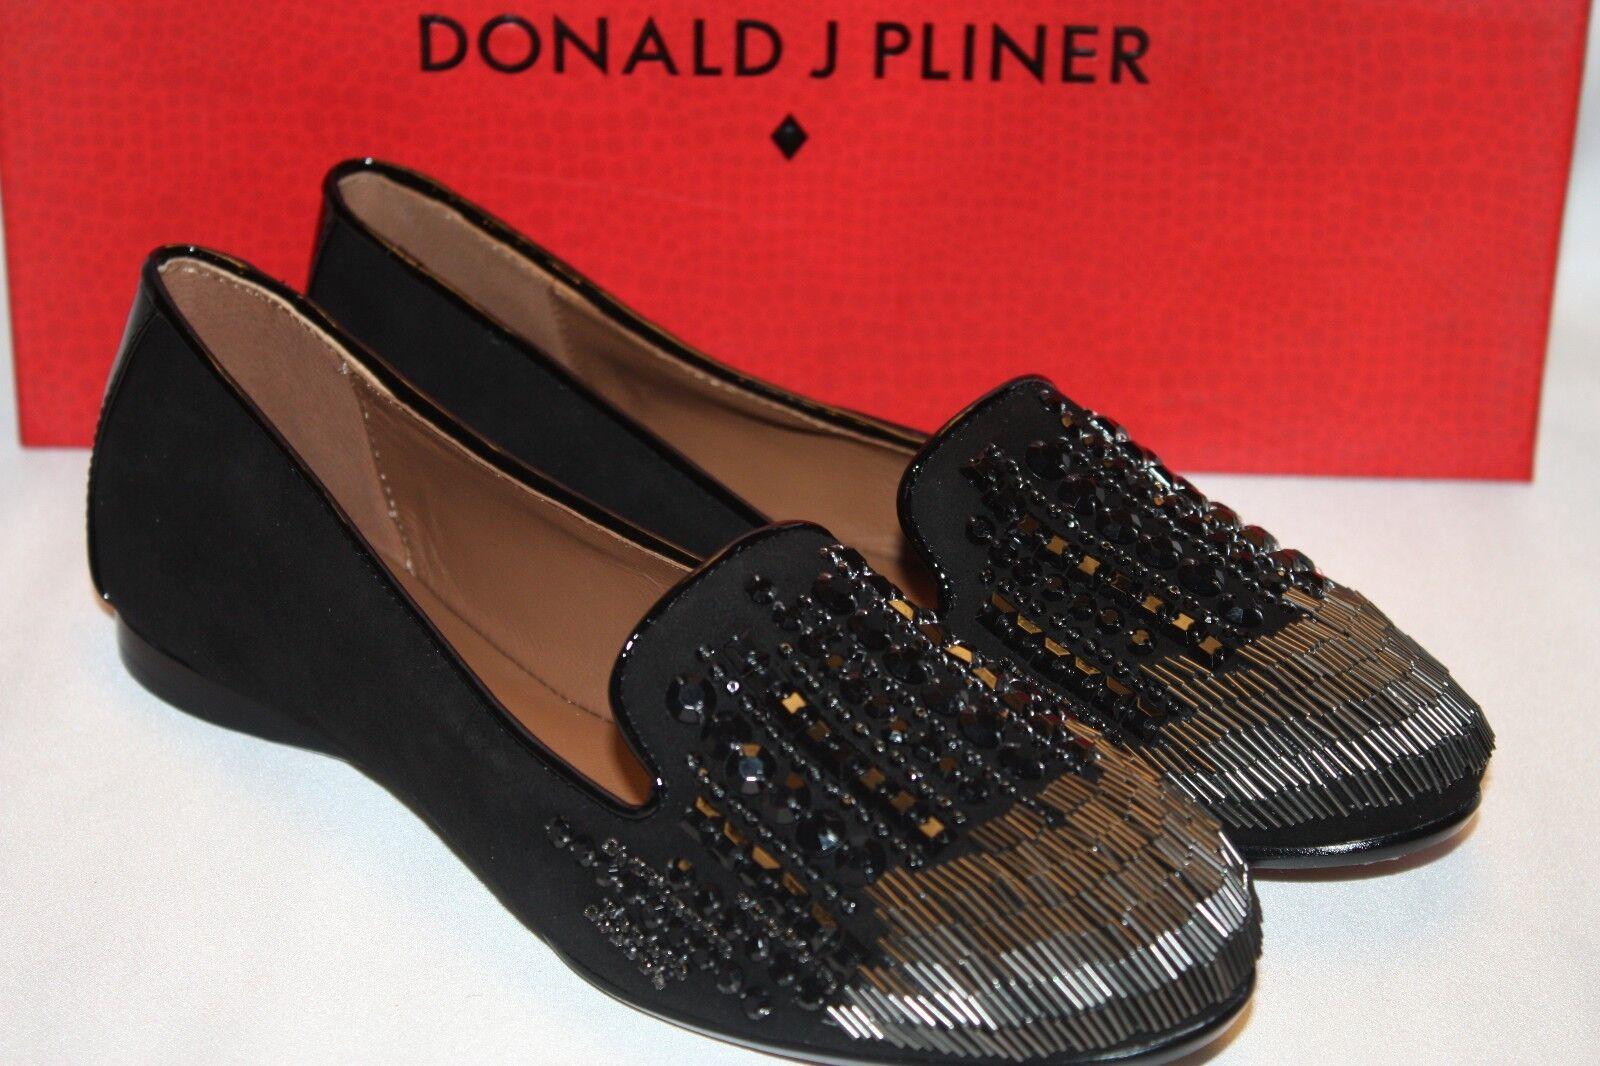 NEW! NIB Donald J Pliner DITA Black Kid Suede Sparkle Beaded Smoking Loafer $198